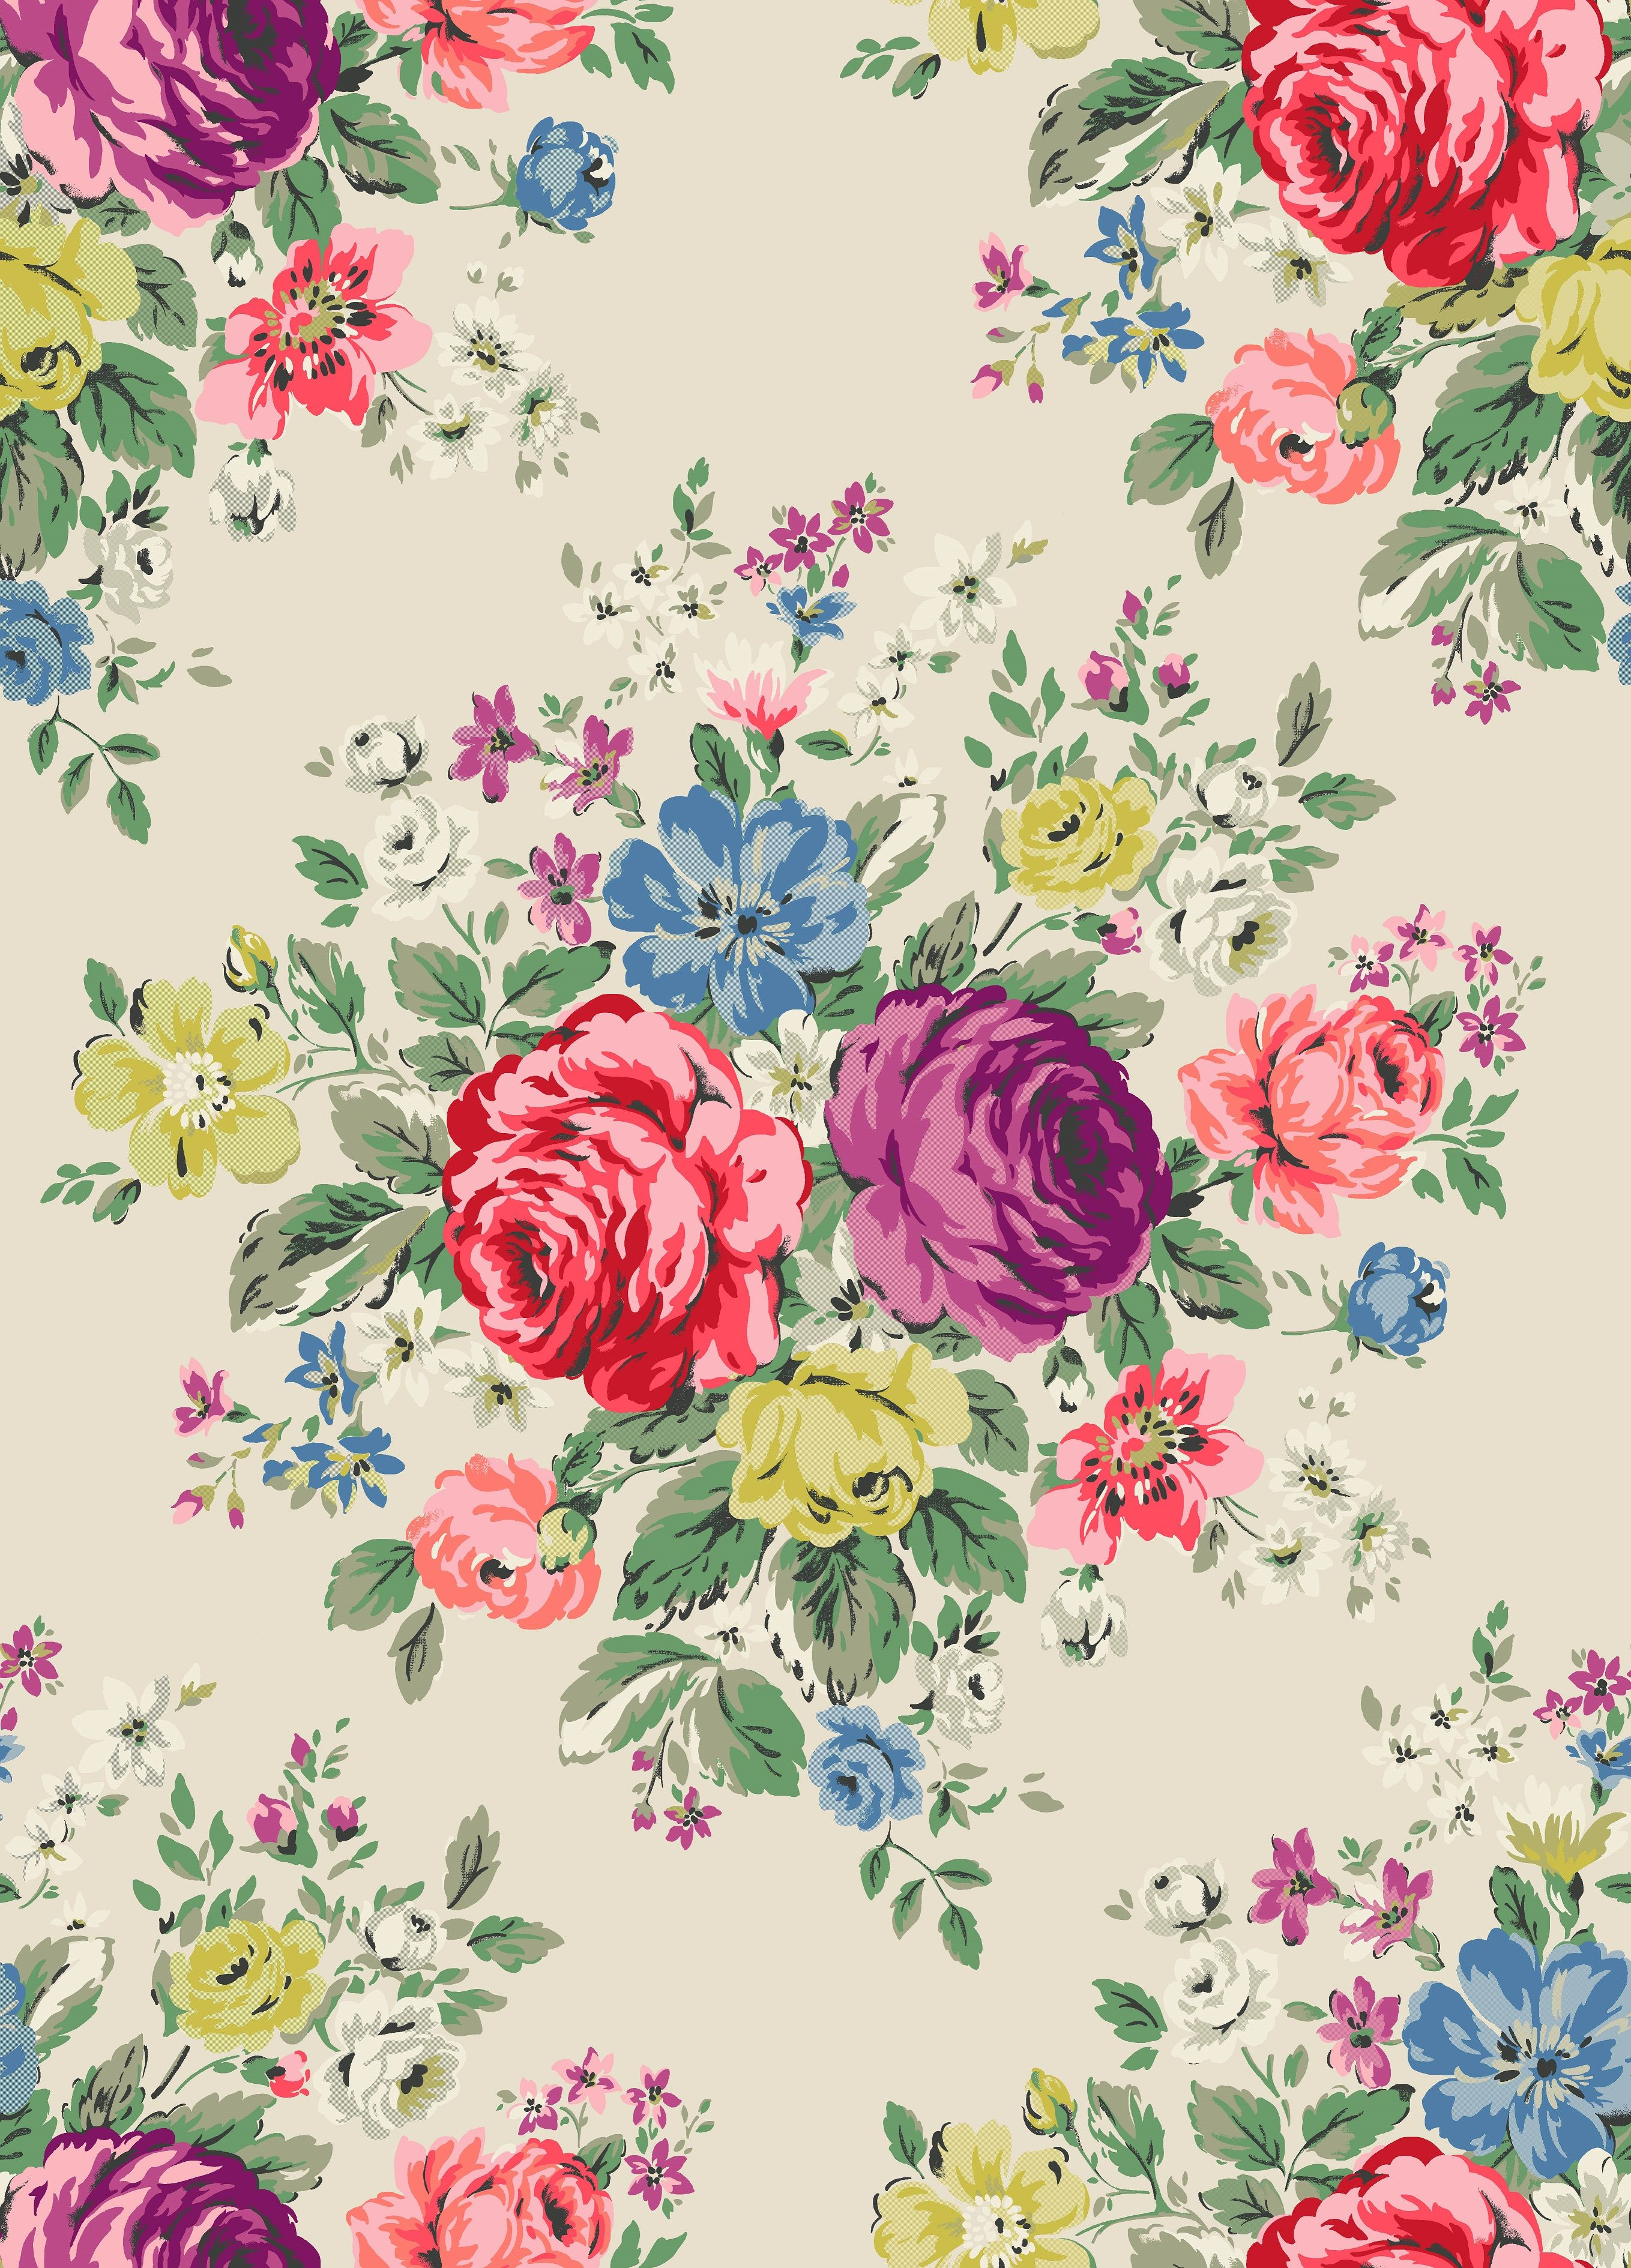 Introducing Hampstead Rose Cath Kidston Iphone Wallpaper Pattern Flower Wallpaper Iphone Wallpaper Vintage